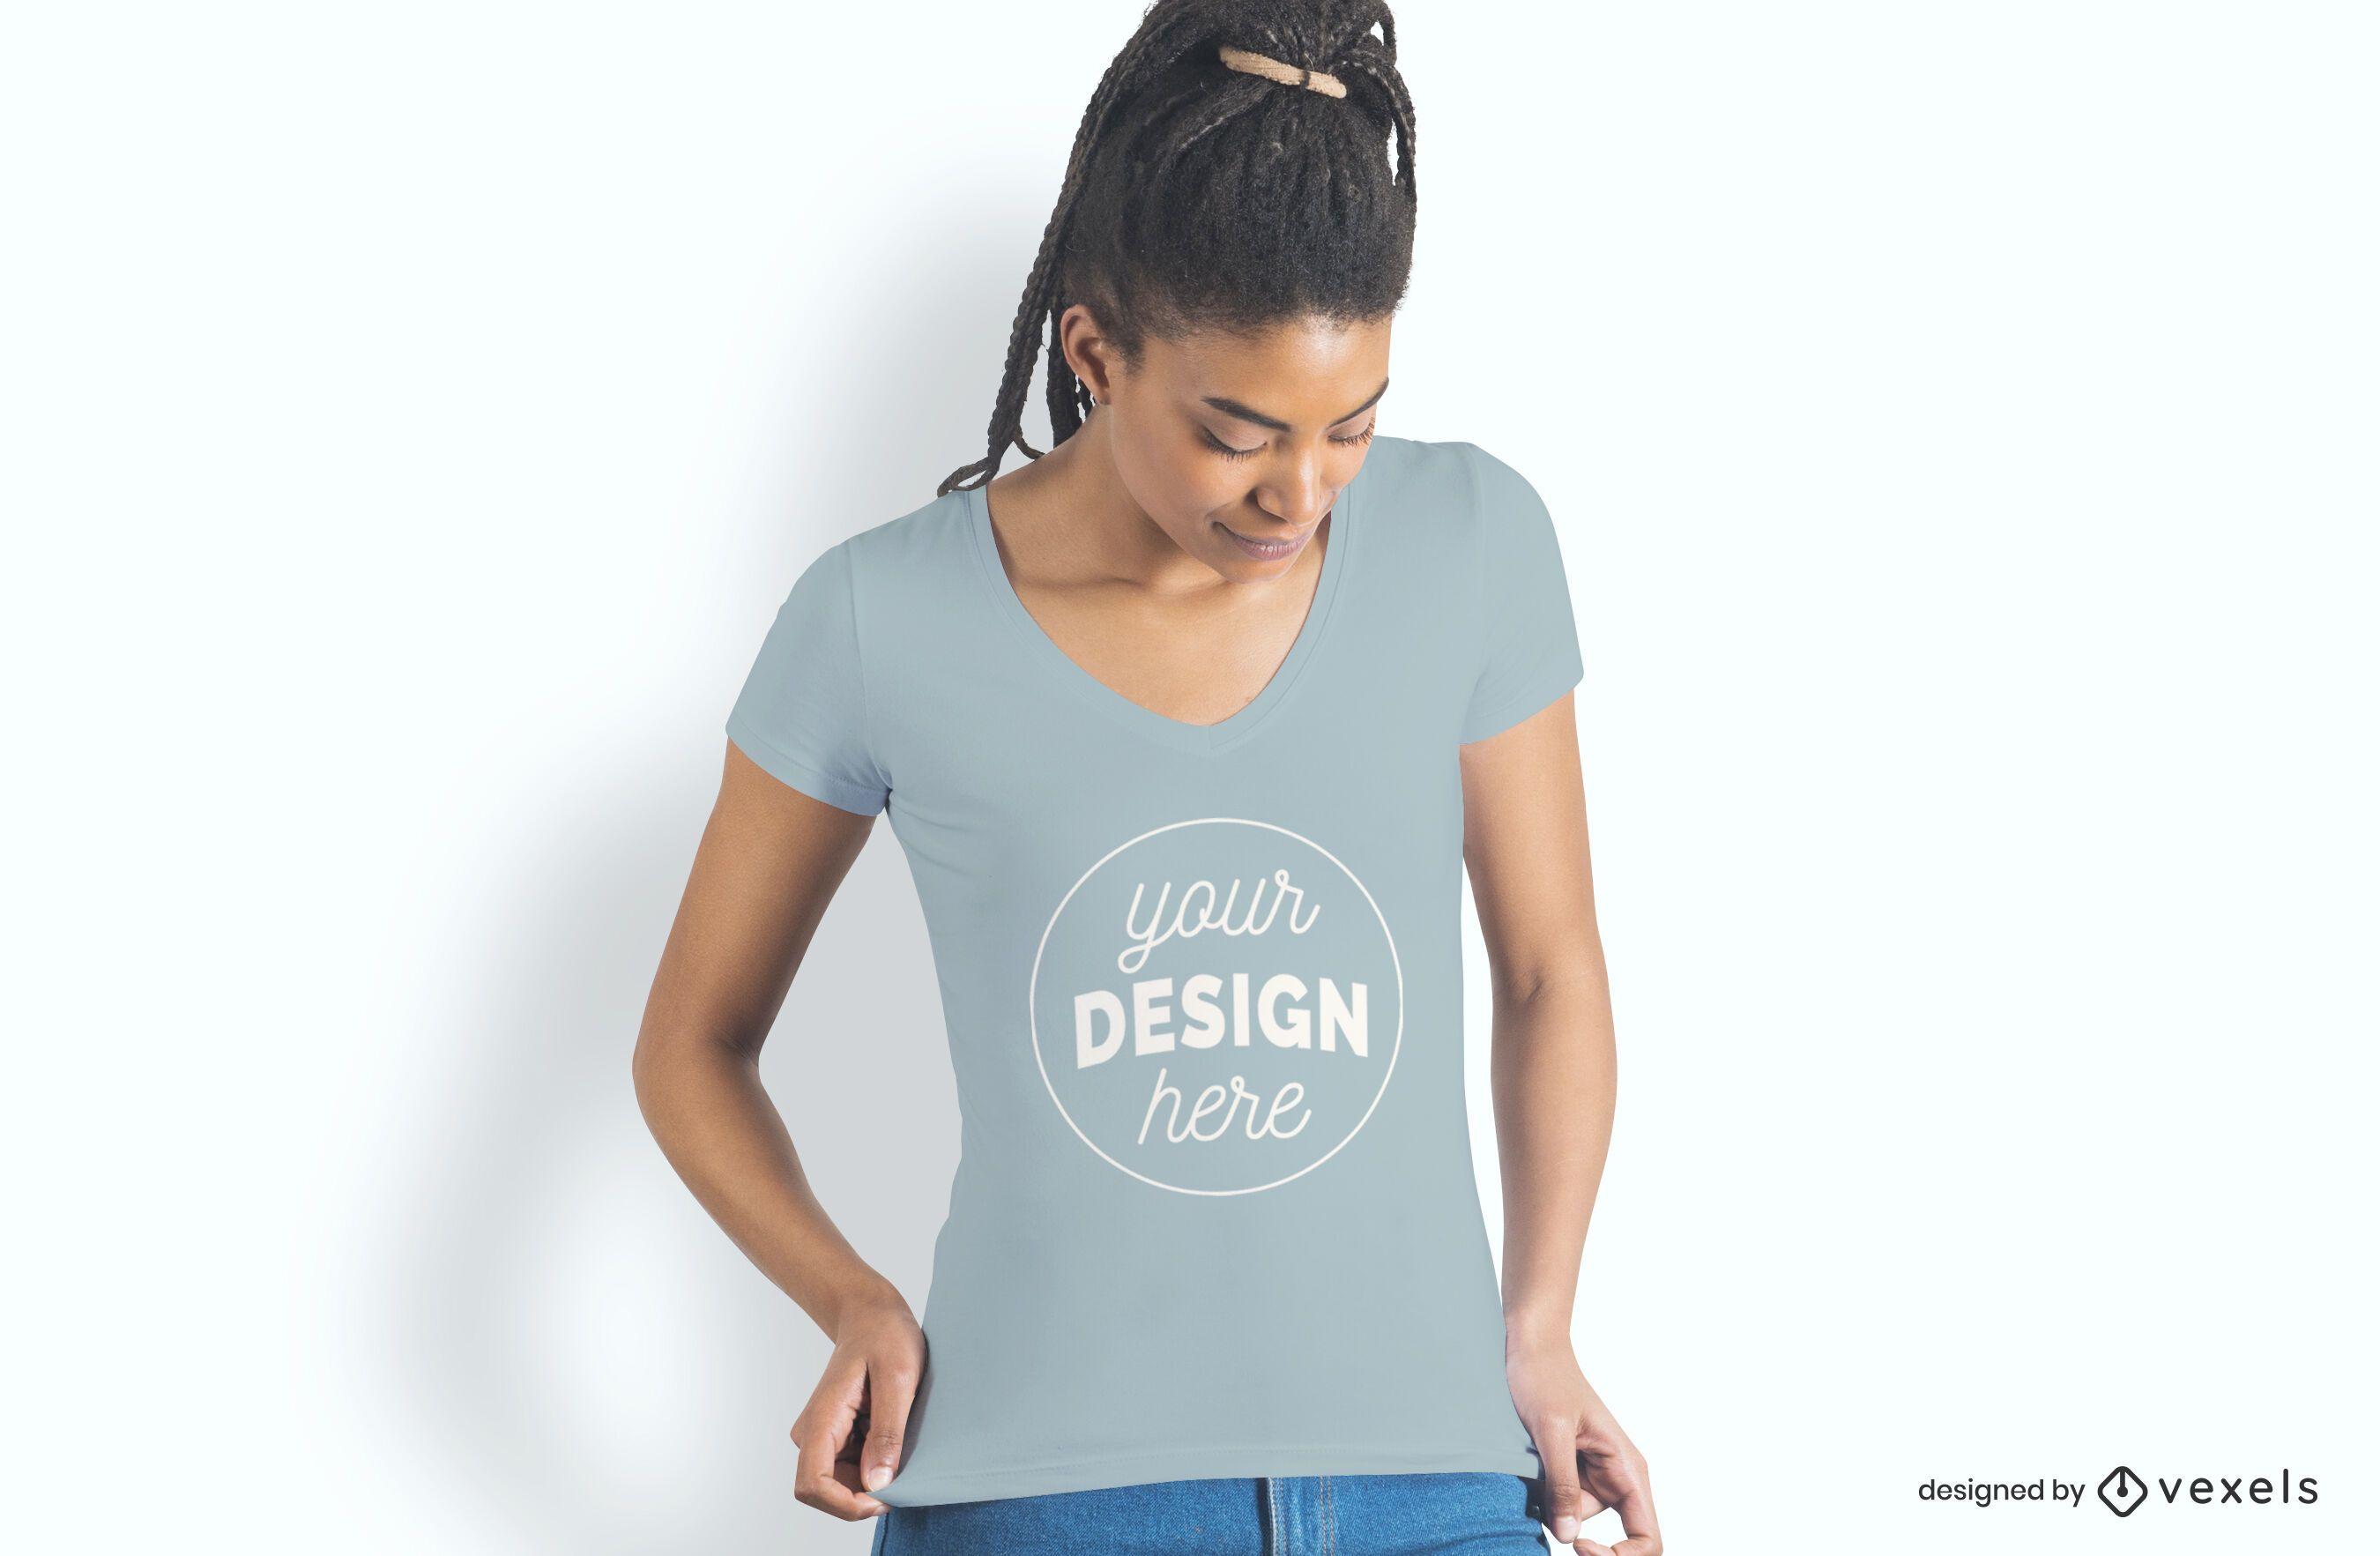 Design de maquete de modelo feminino